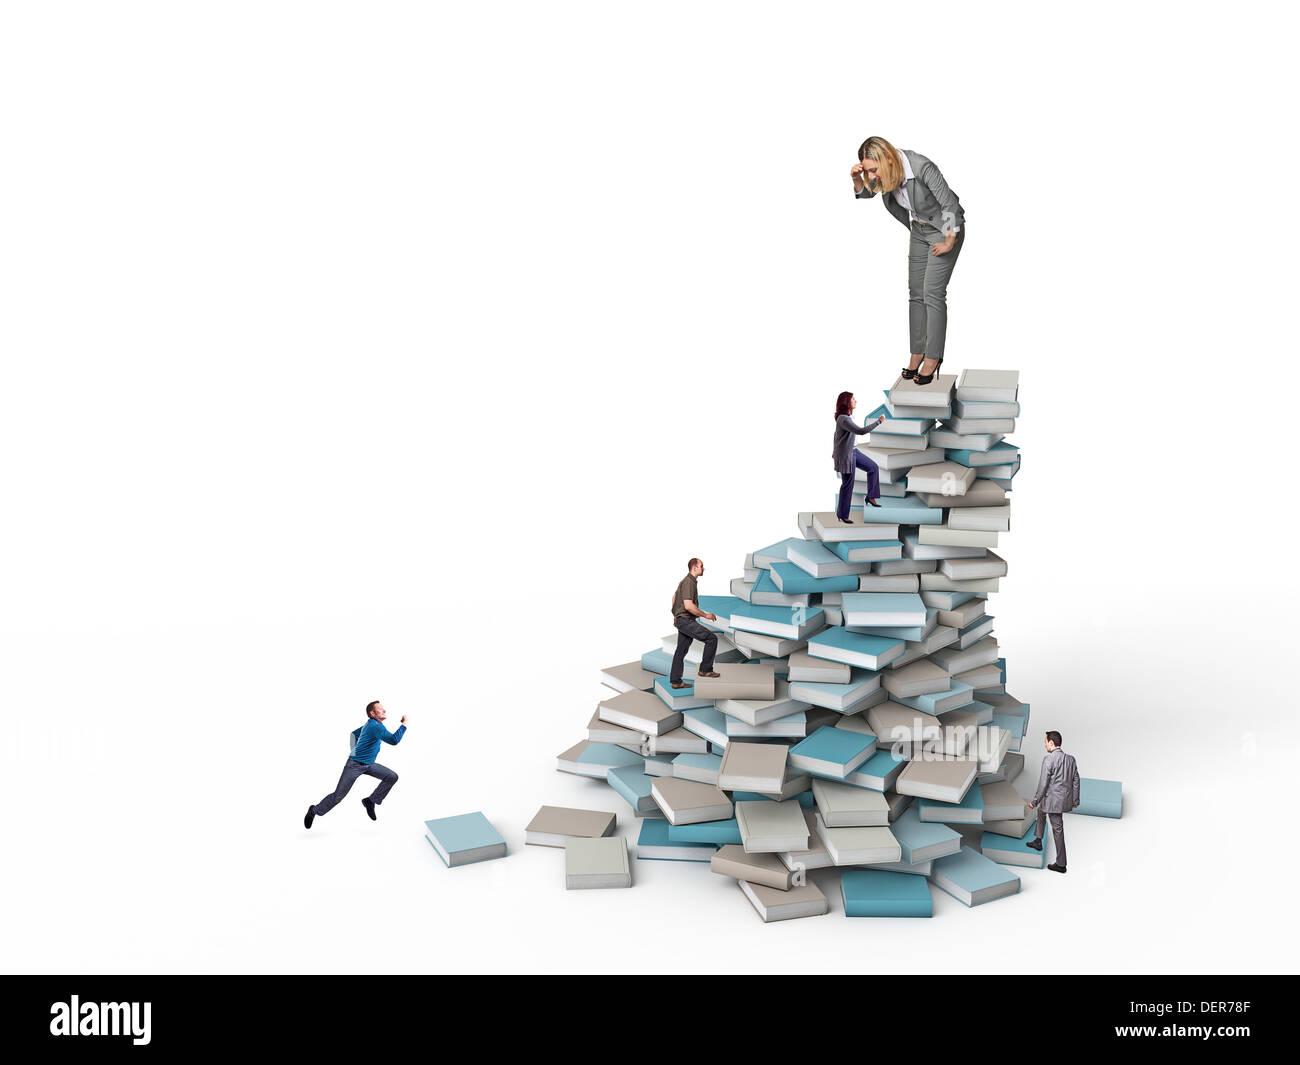 people run on books pile - Stock Image